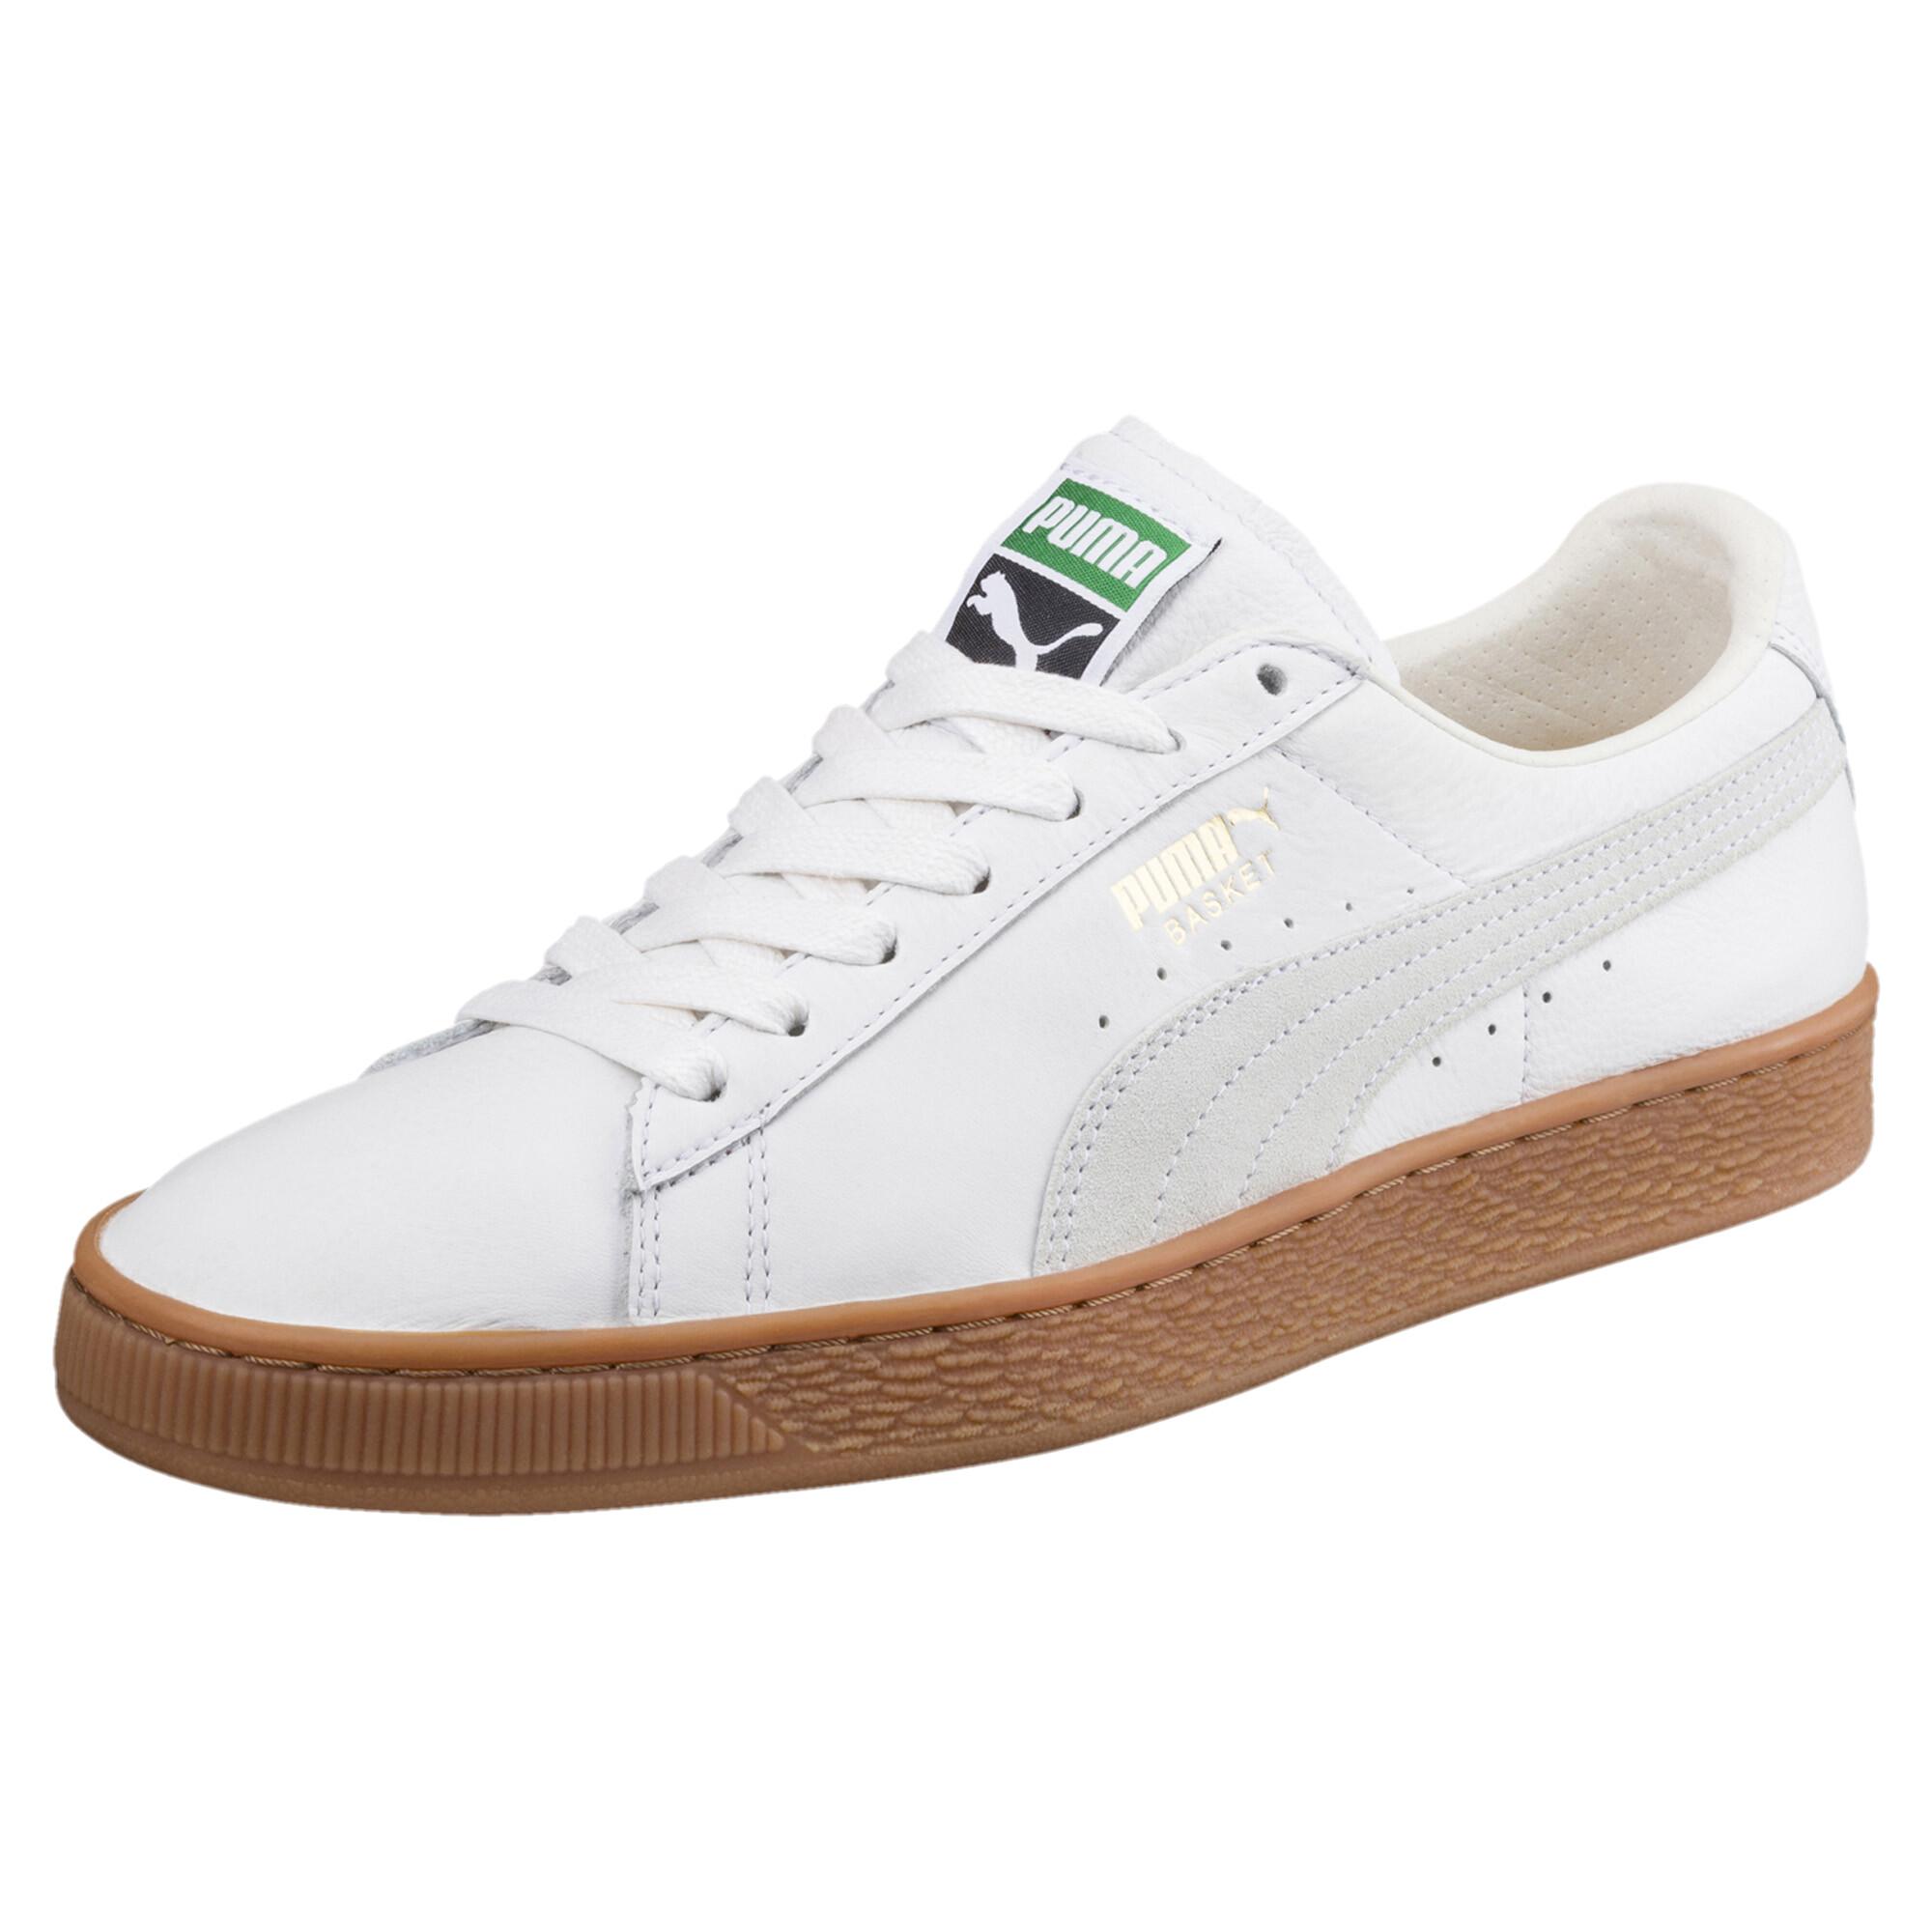 Image Puma Men's Basket Classic Gum Deluxe Sneakers #1